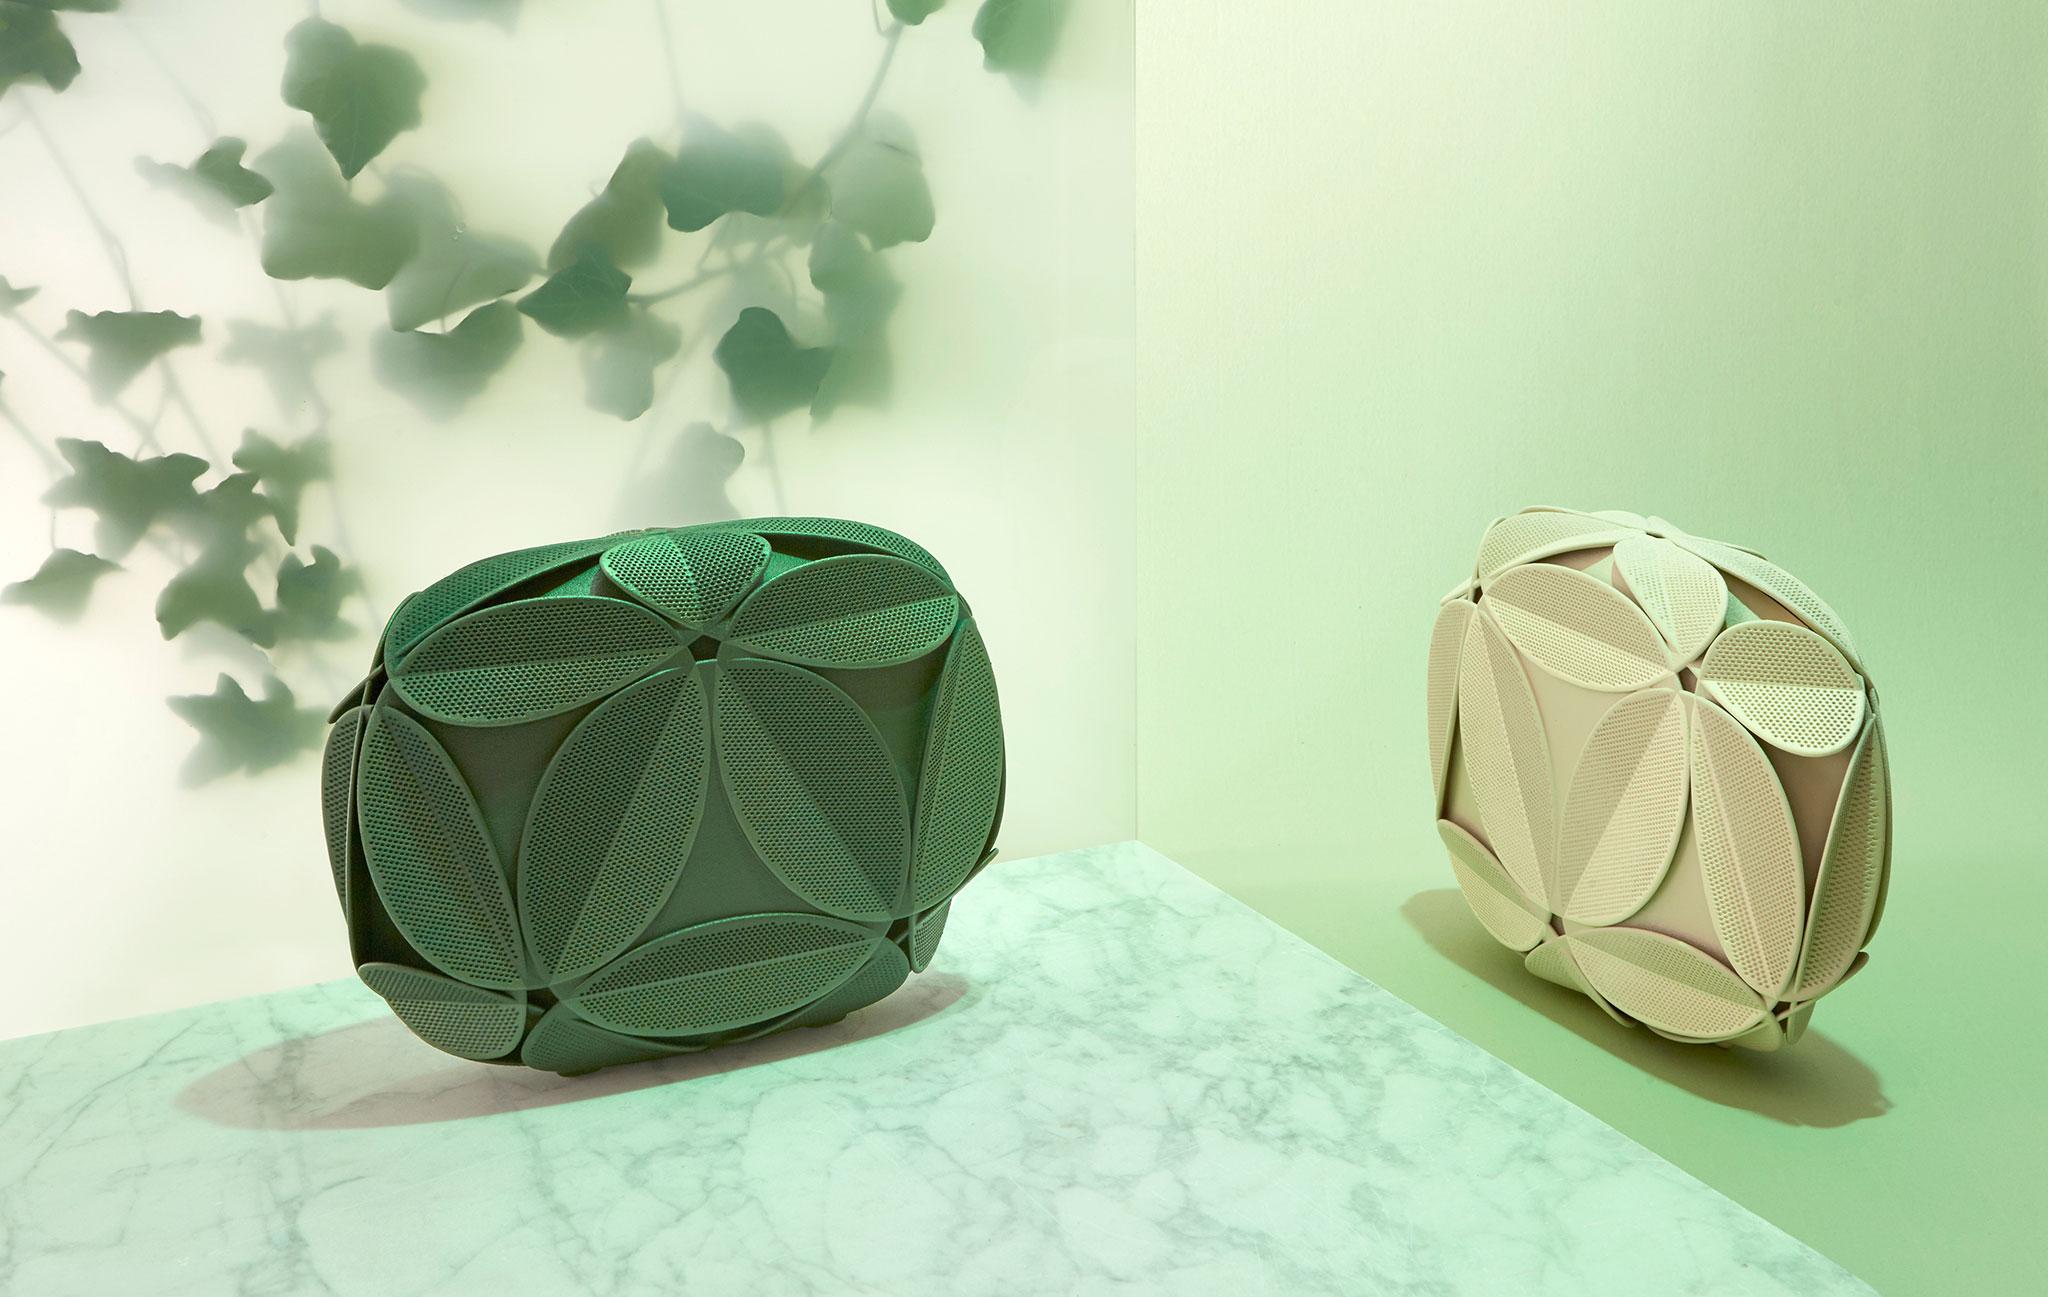 Ivy-3D-Printed-Clutch-Maison-203-02